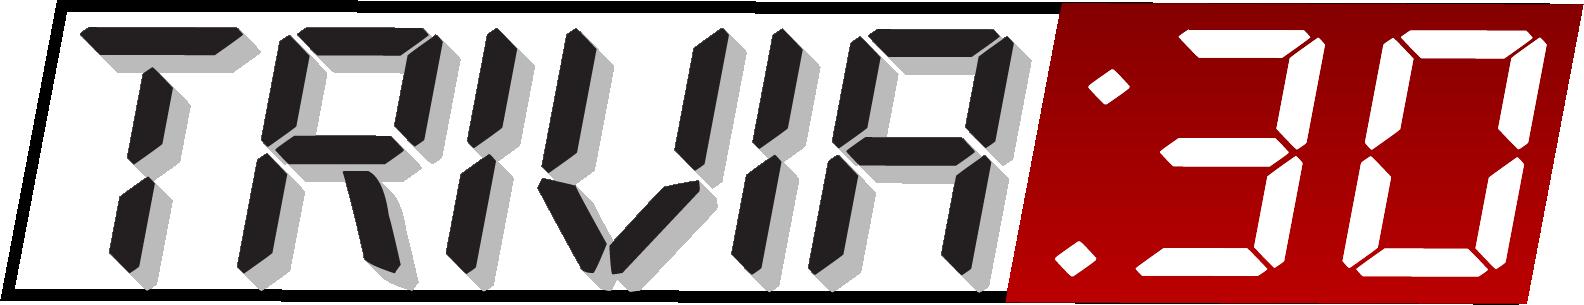 Trivia30_logo.png2